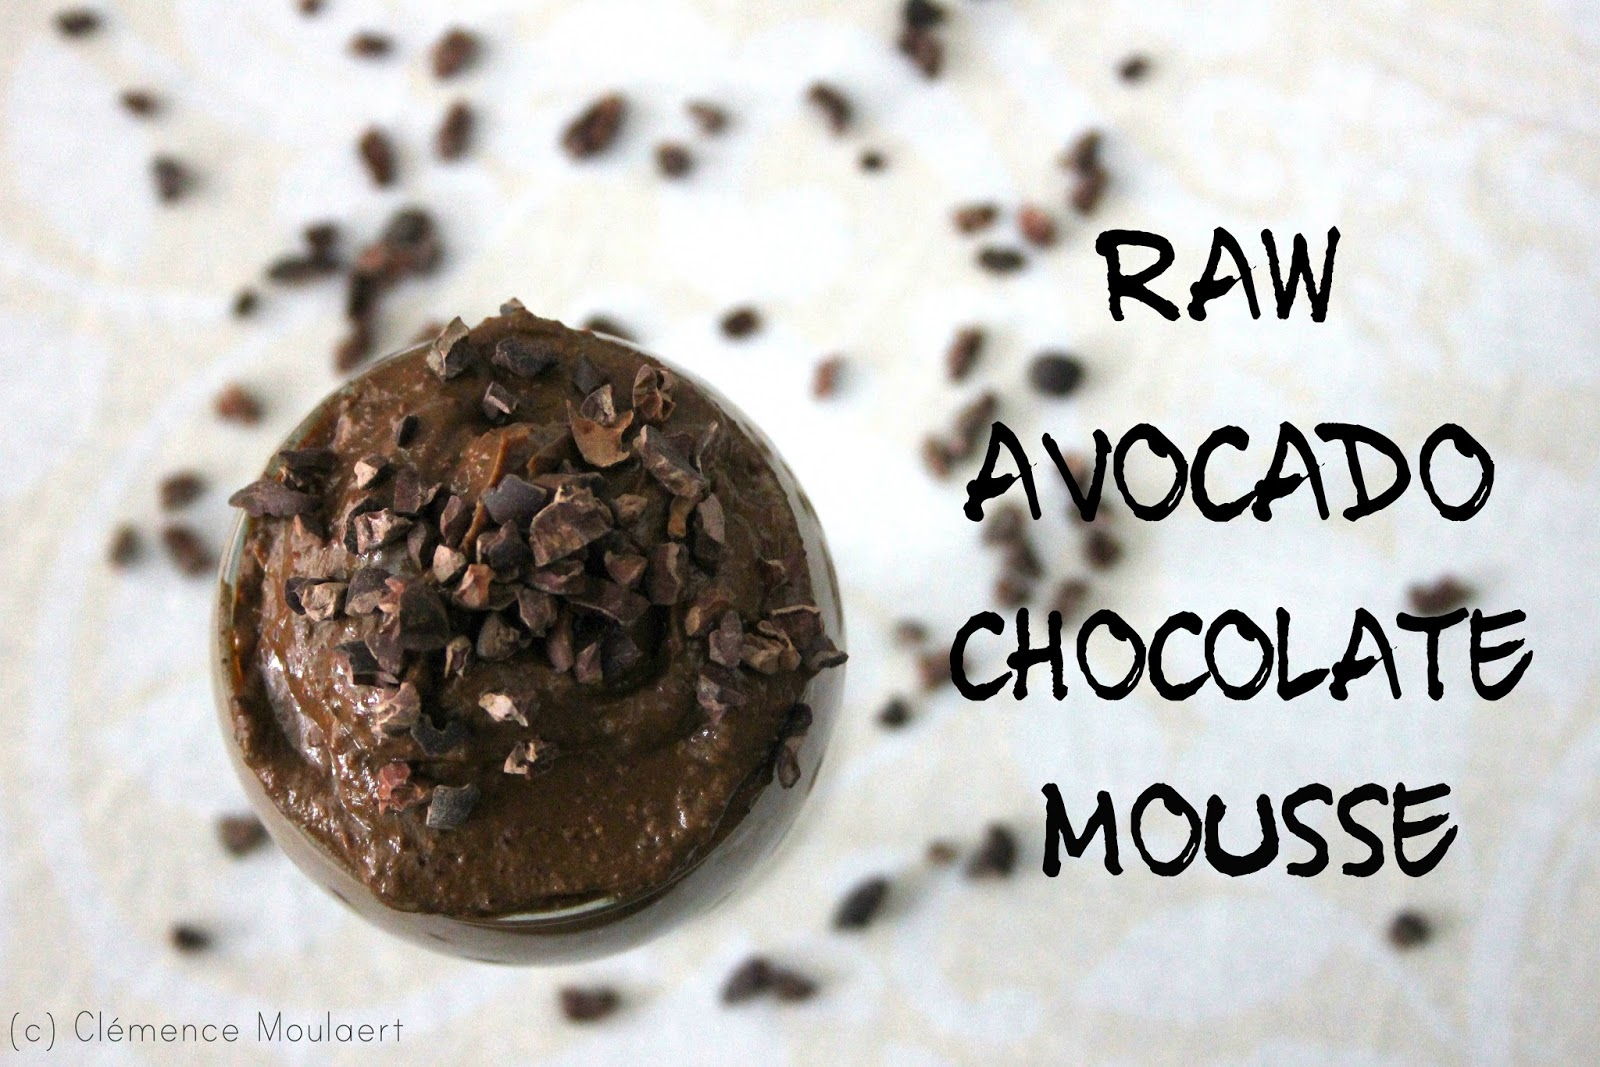 Raw Avocado Chocolate Mousse